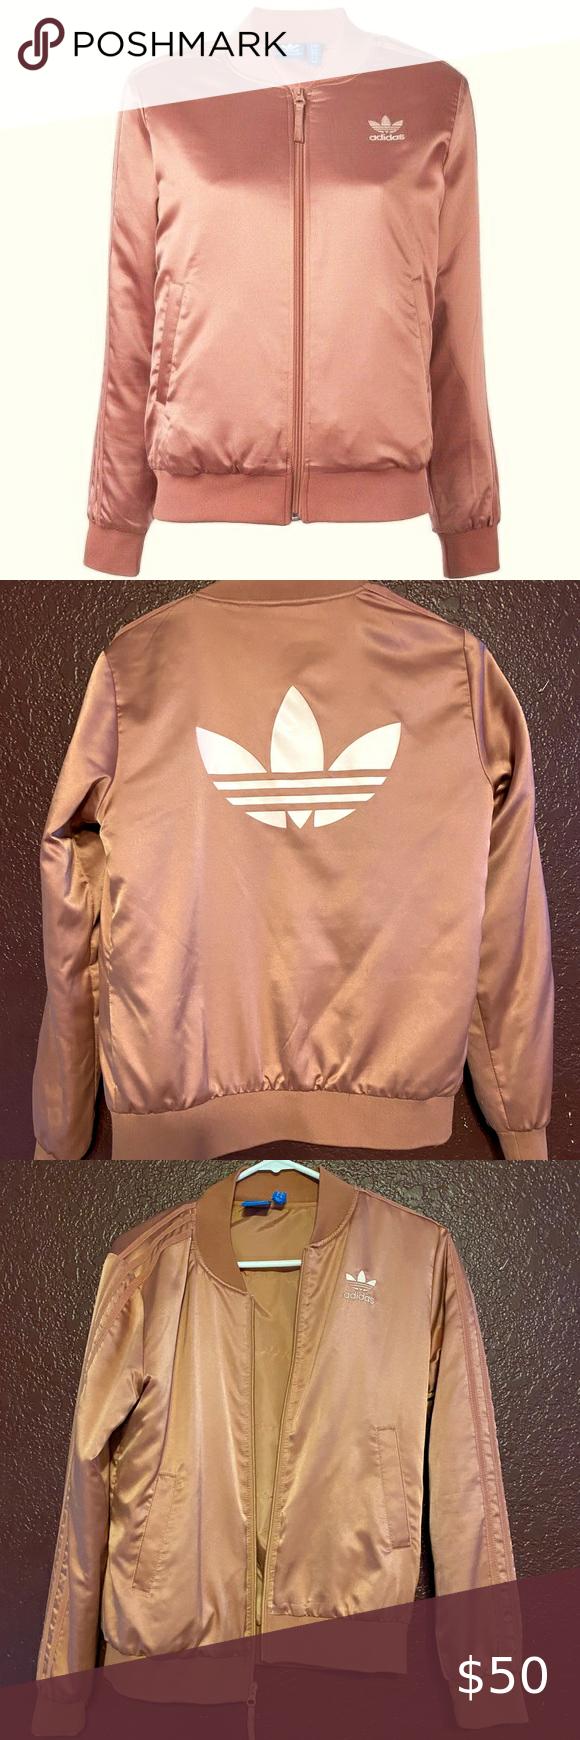 Adidas Originals Trefoil Satin Jacket Adidas Origi